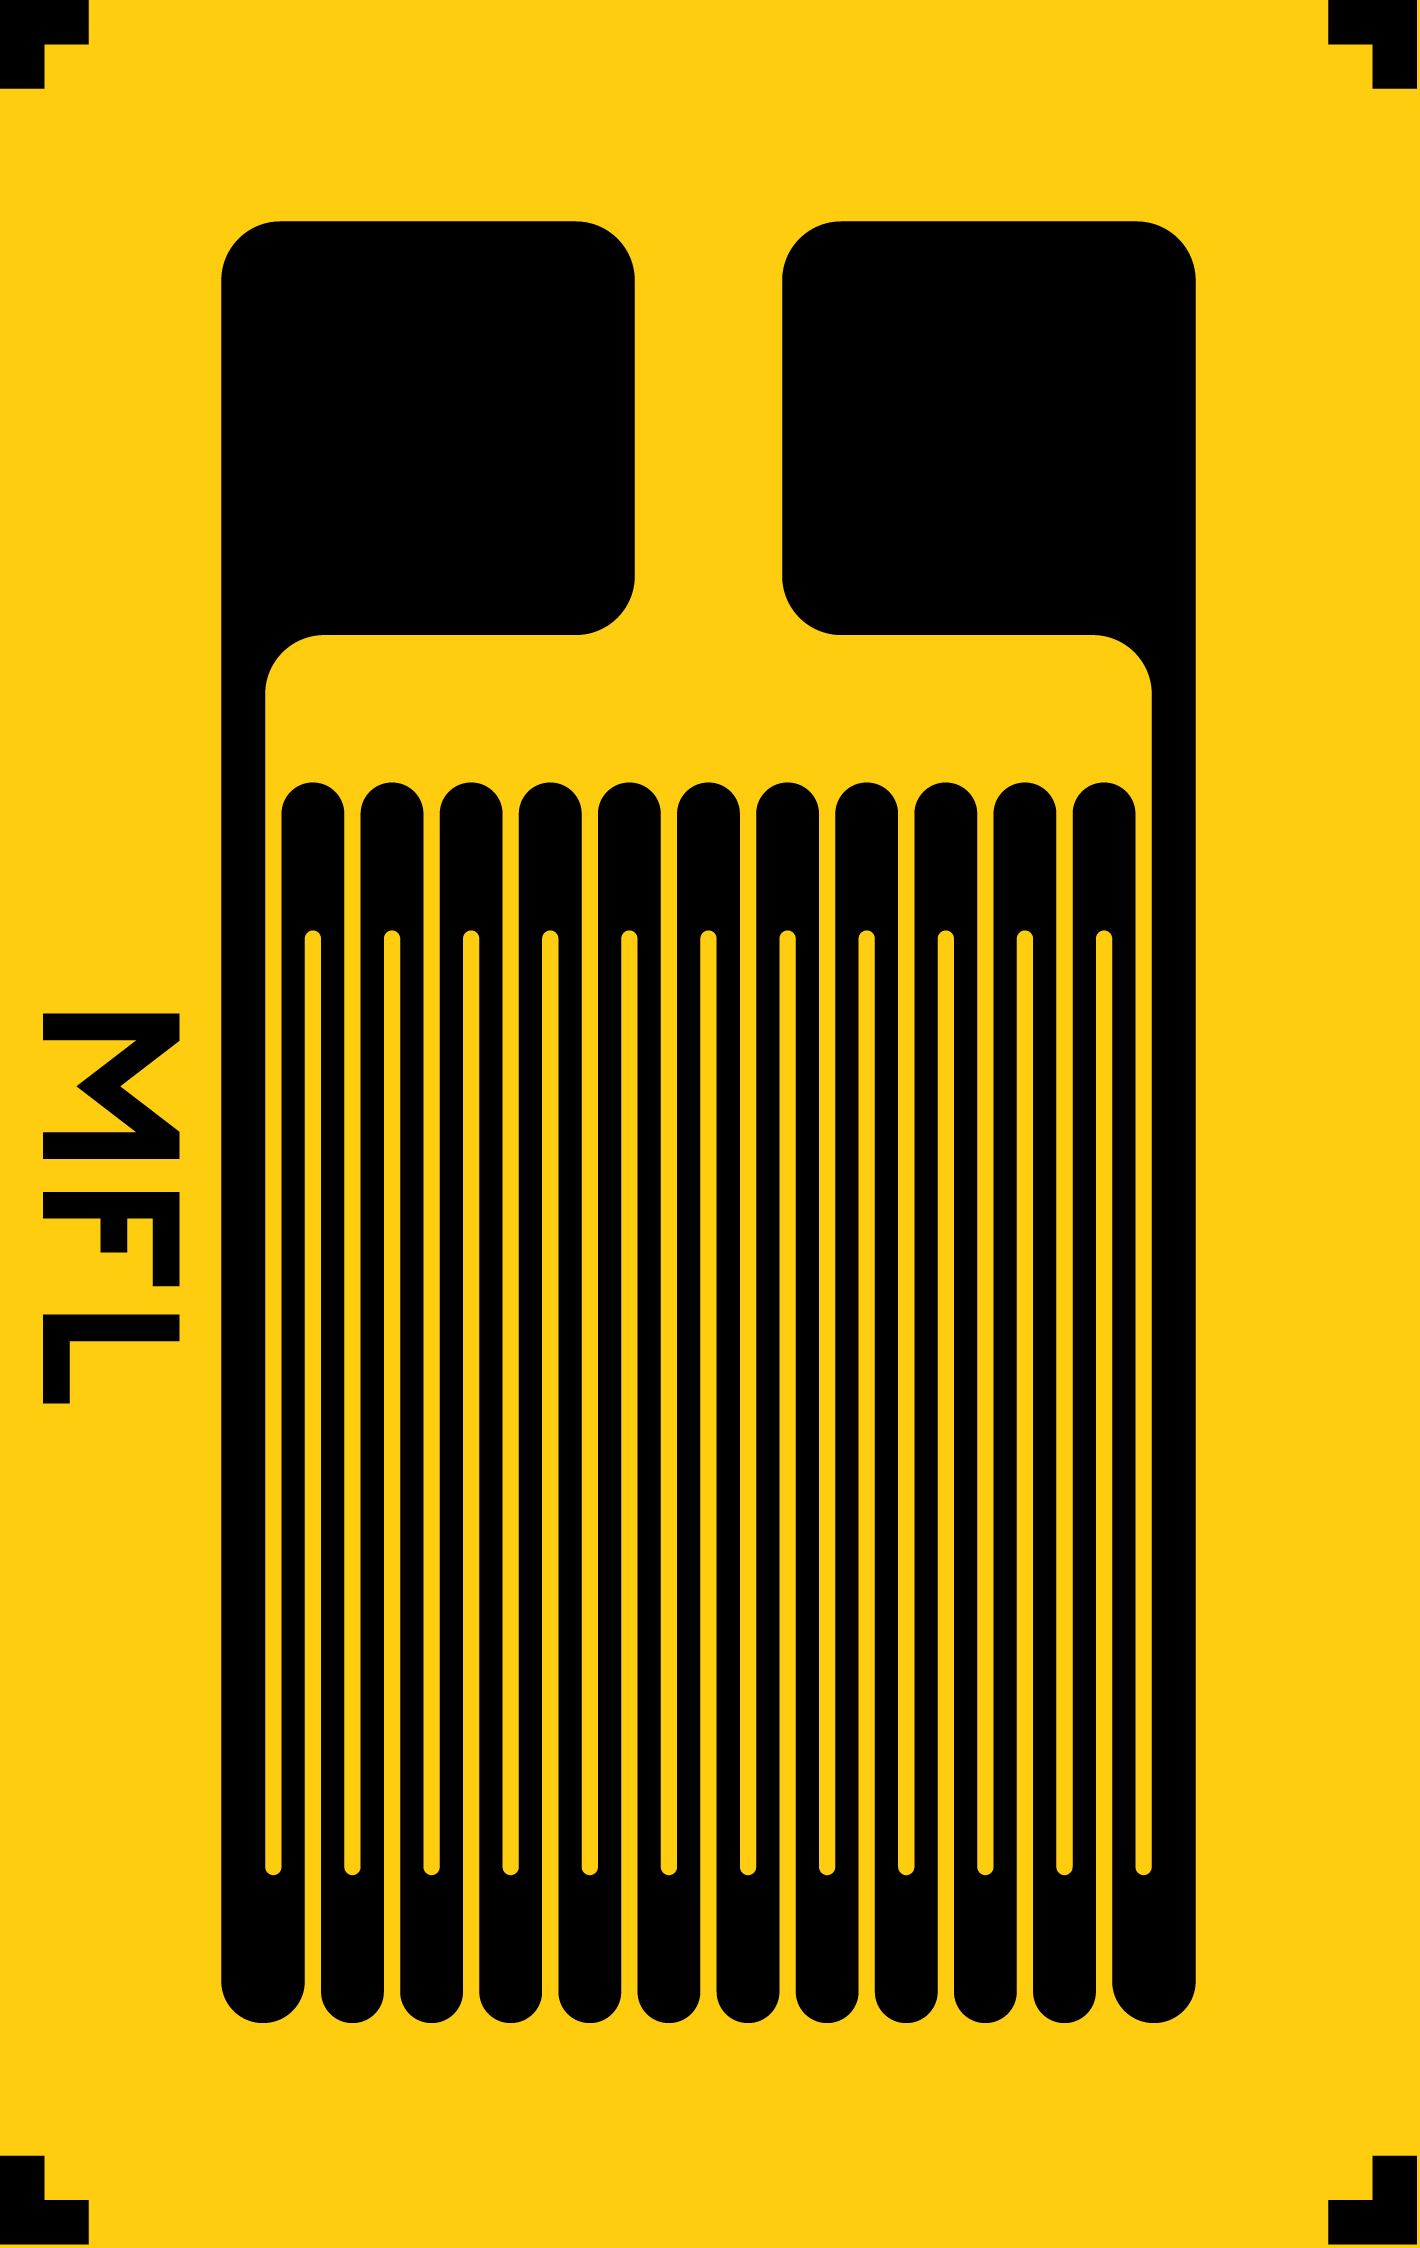 LN3B-24-PNXX-Y